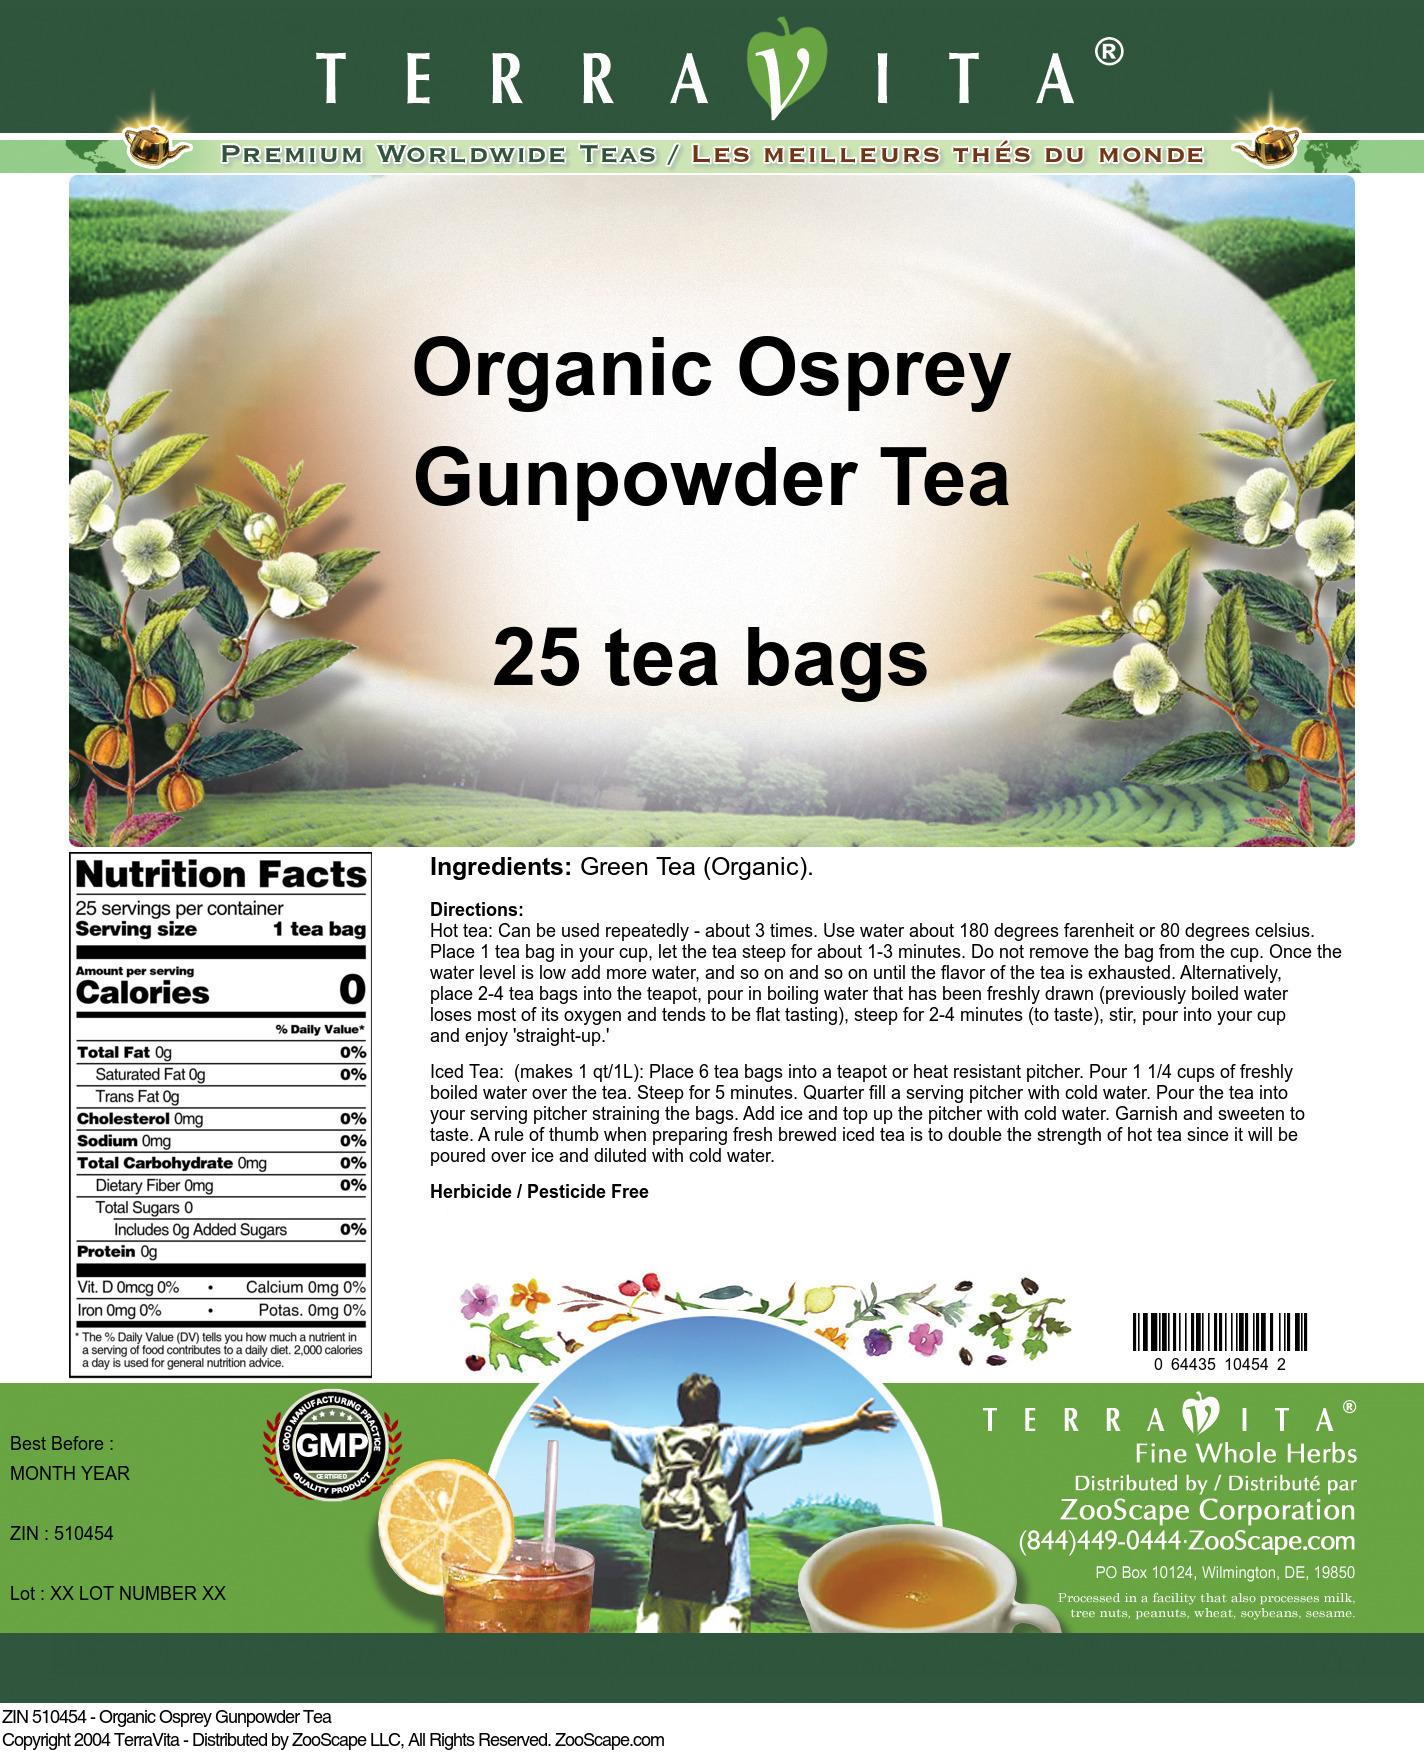 Organic Osprey Gunpowder Tea